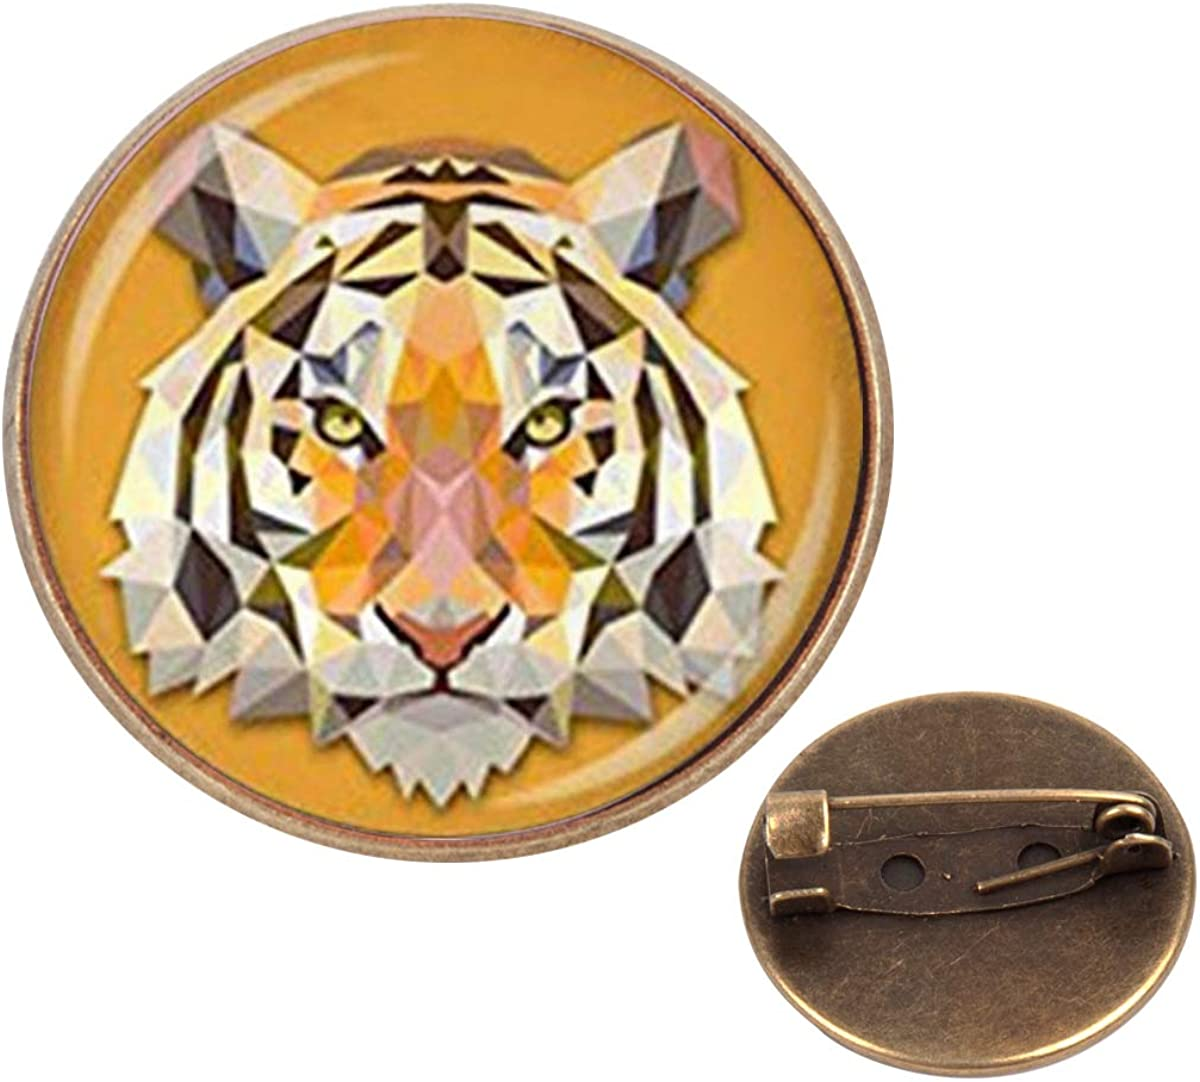 decorative gold stick pin Vintage gold tone mushroom scarf or hat pin